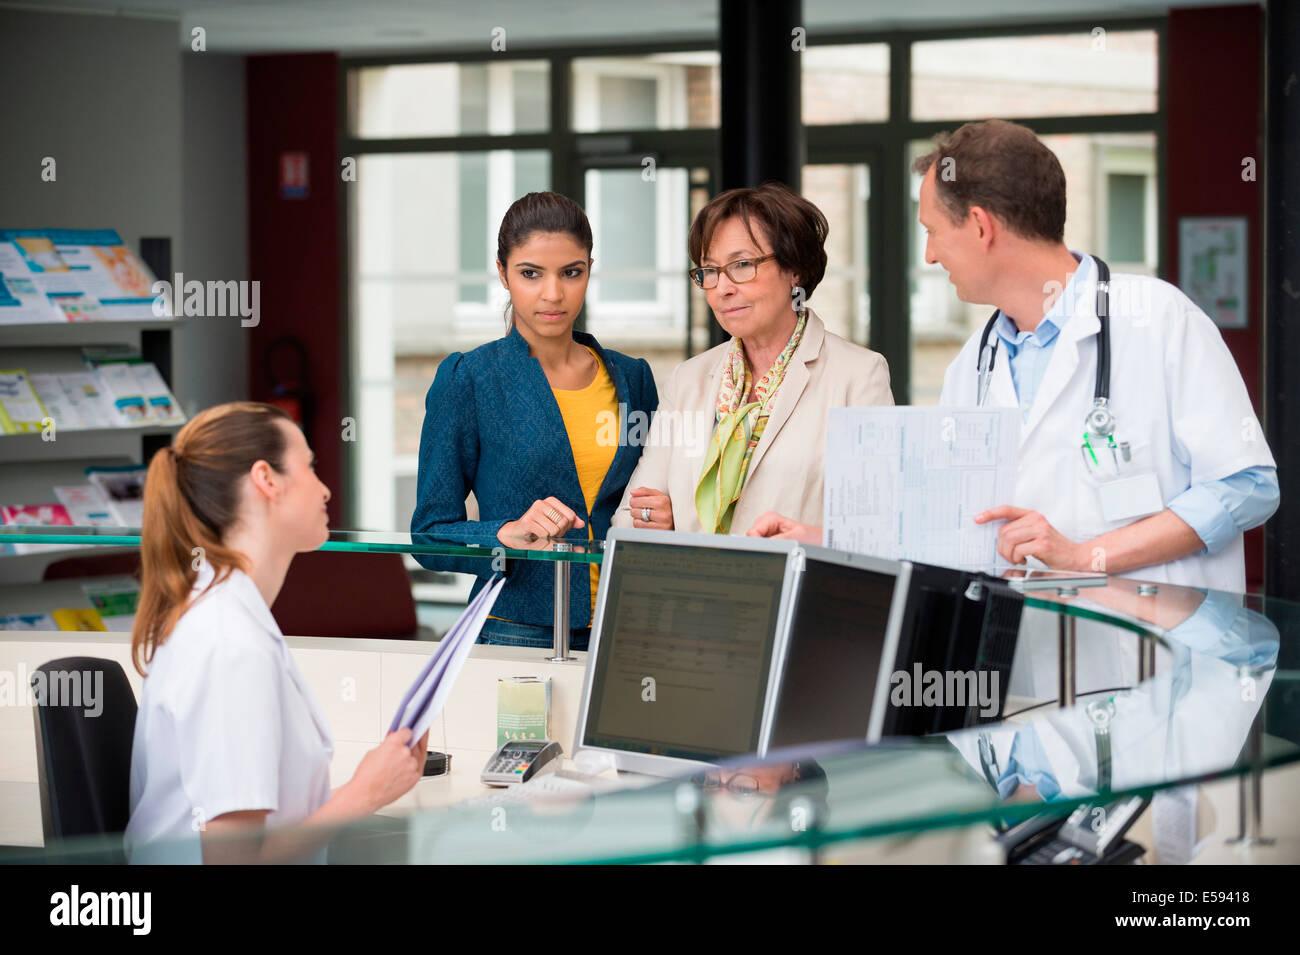 Hospital Reception Stockfotos & Hospital Reception Bilder - Alamy